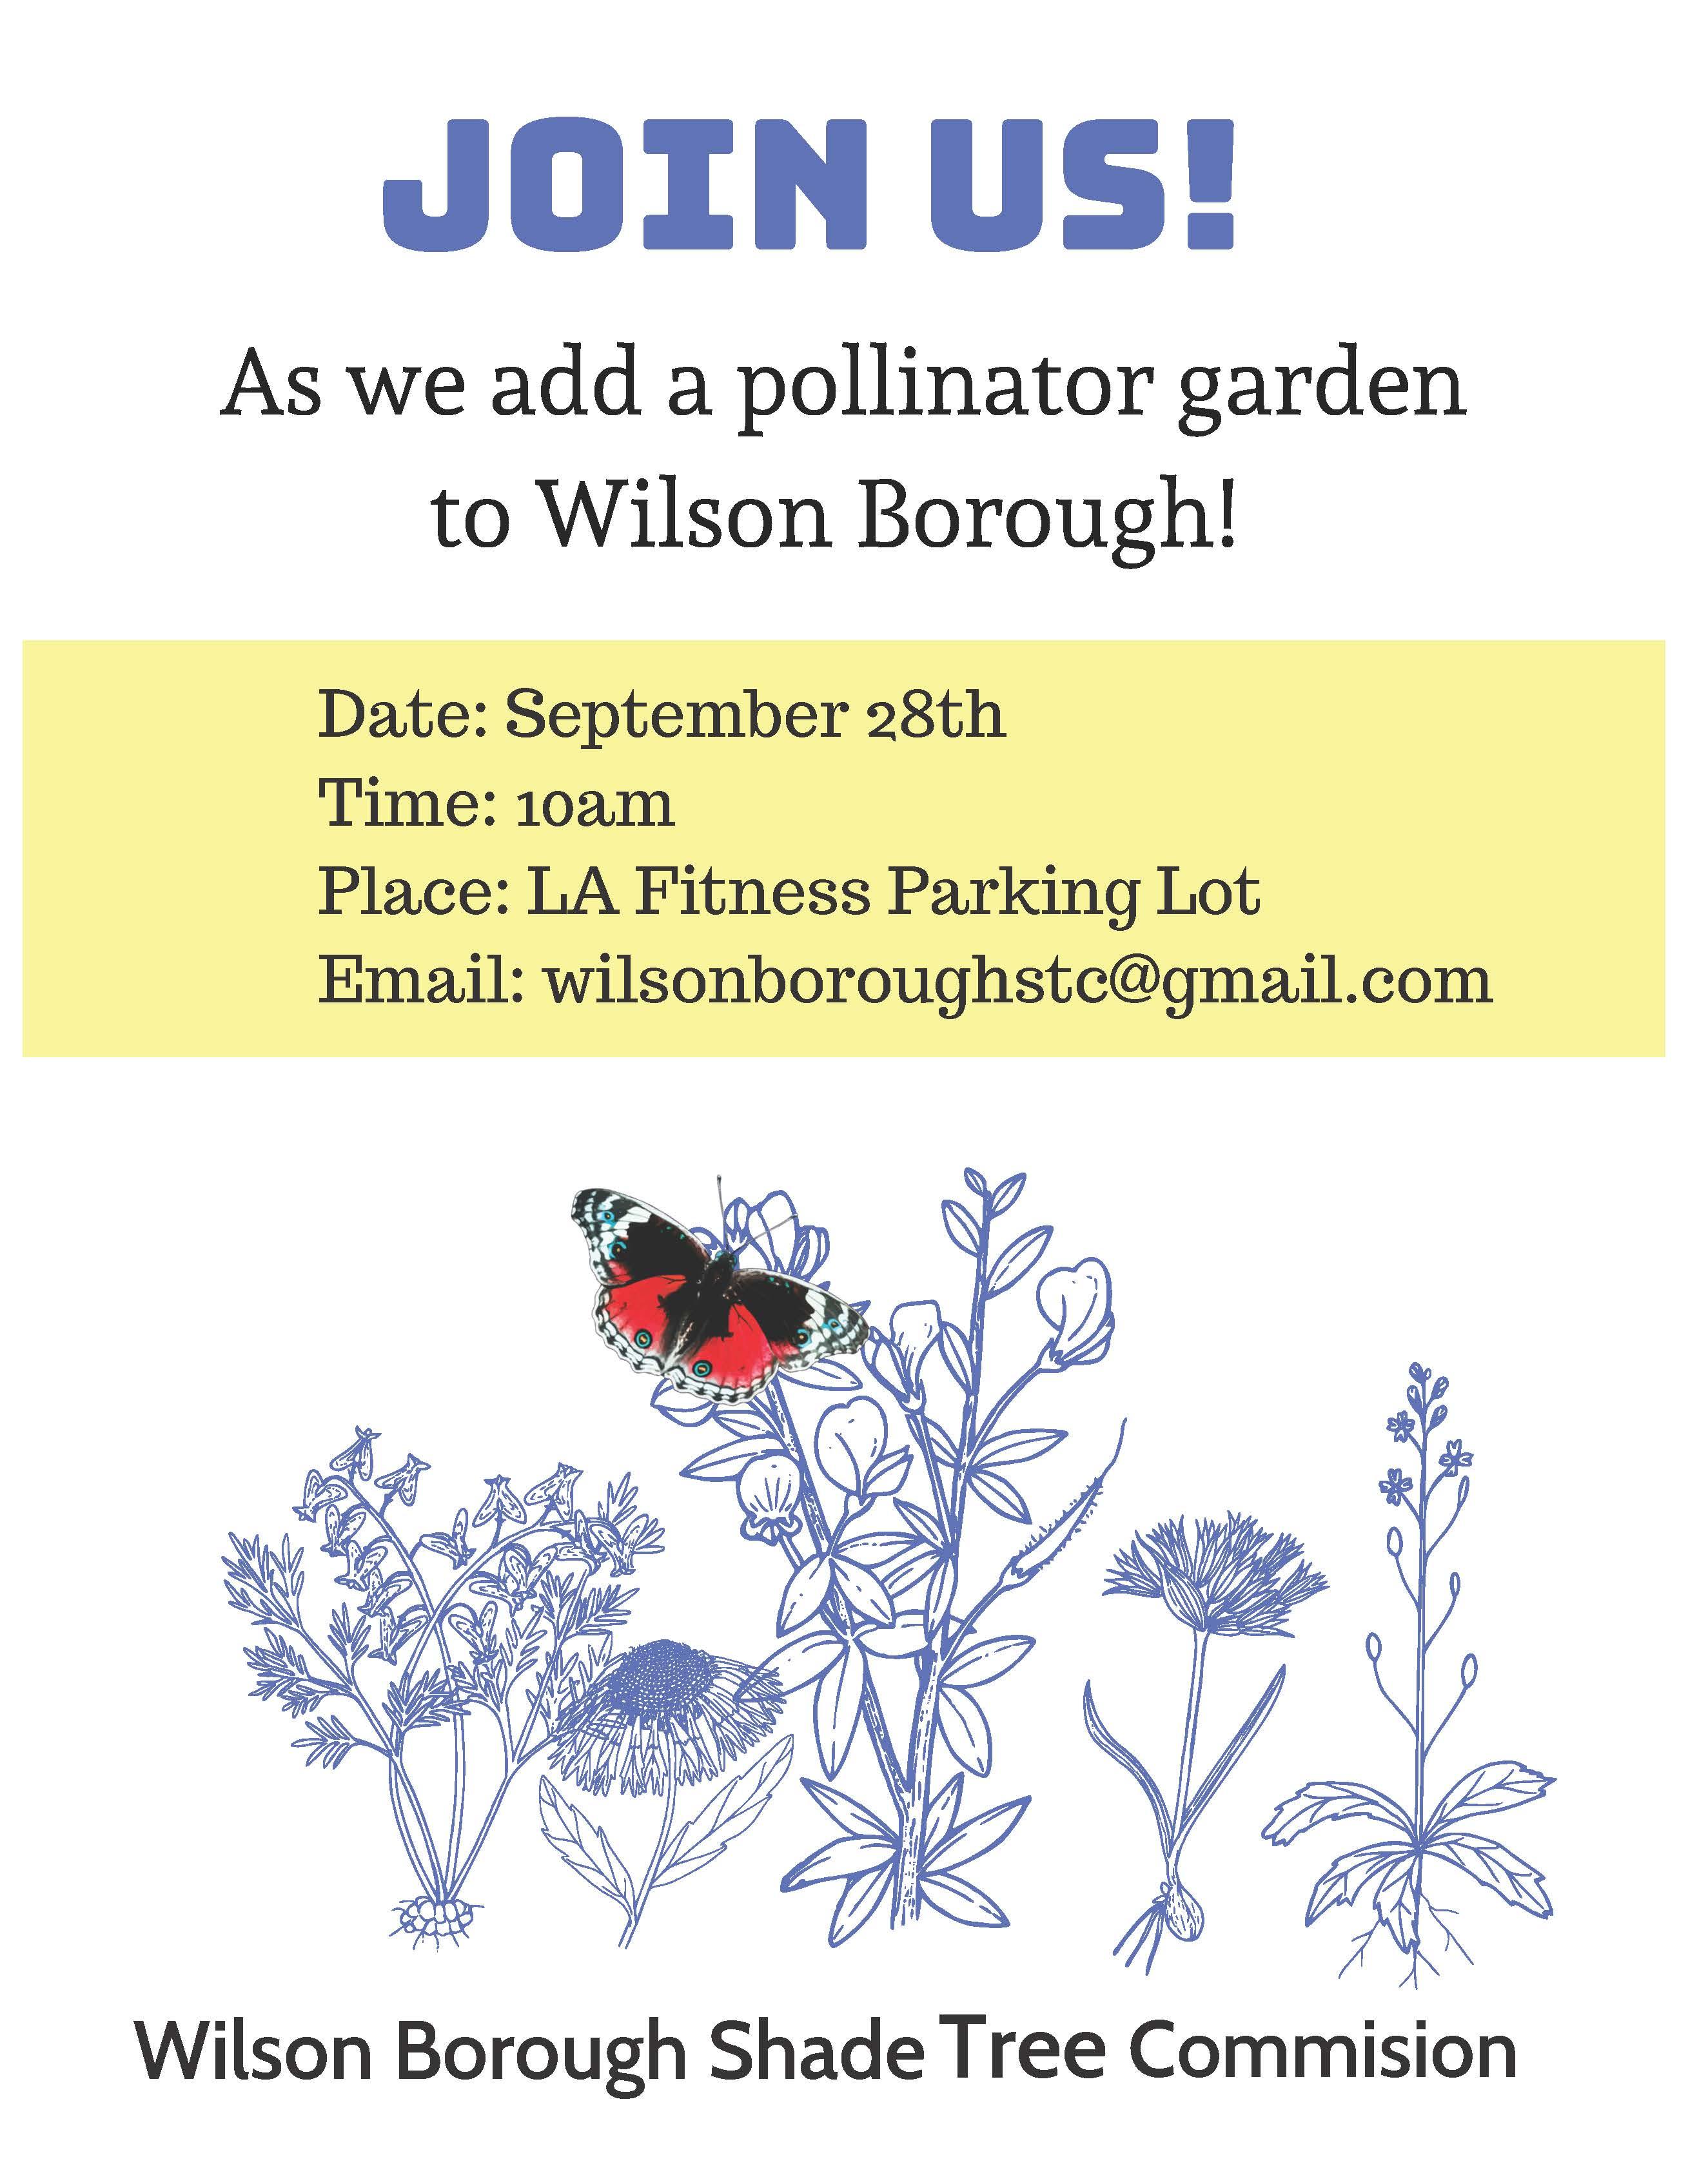 Pollinator Garden Flyer 2019-9-28